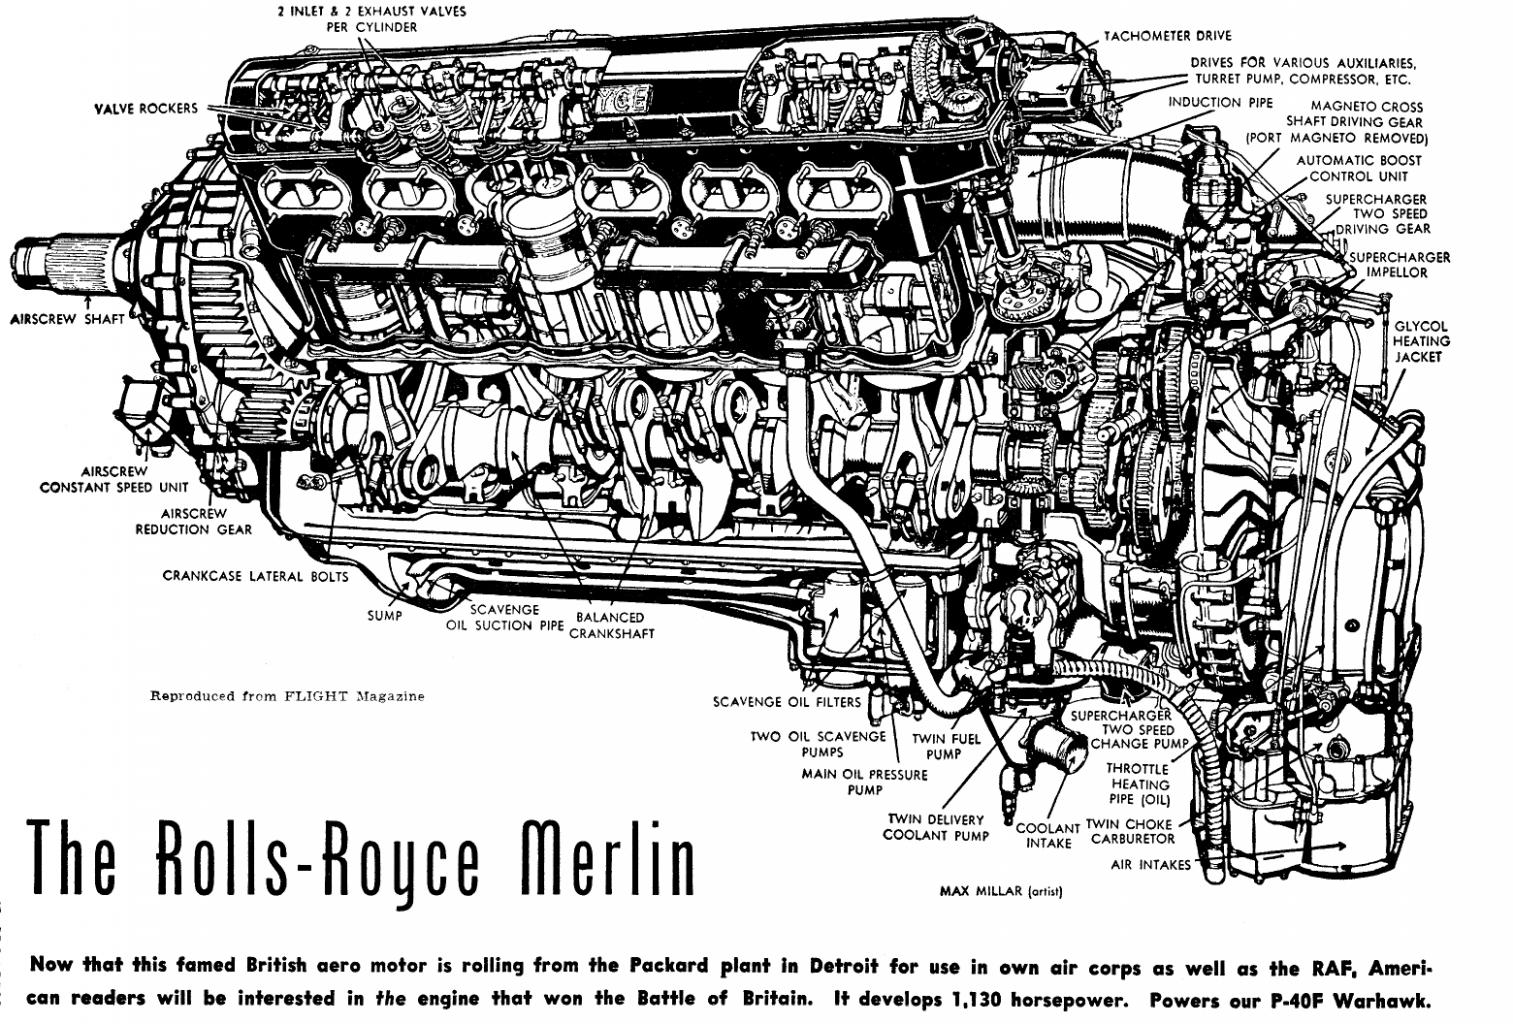 Airplane Engine Diagram Uk In 2020